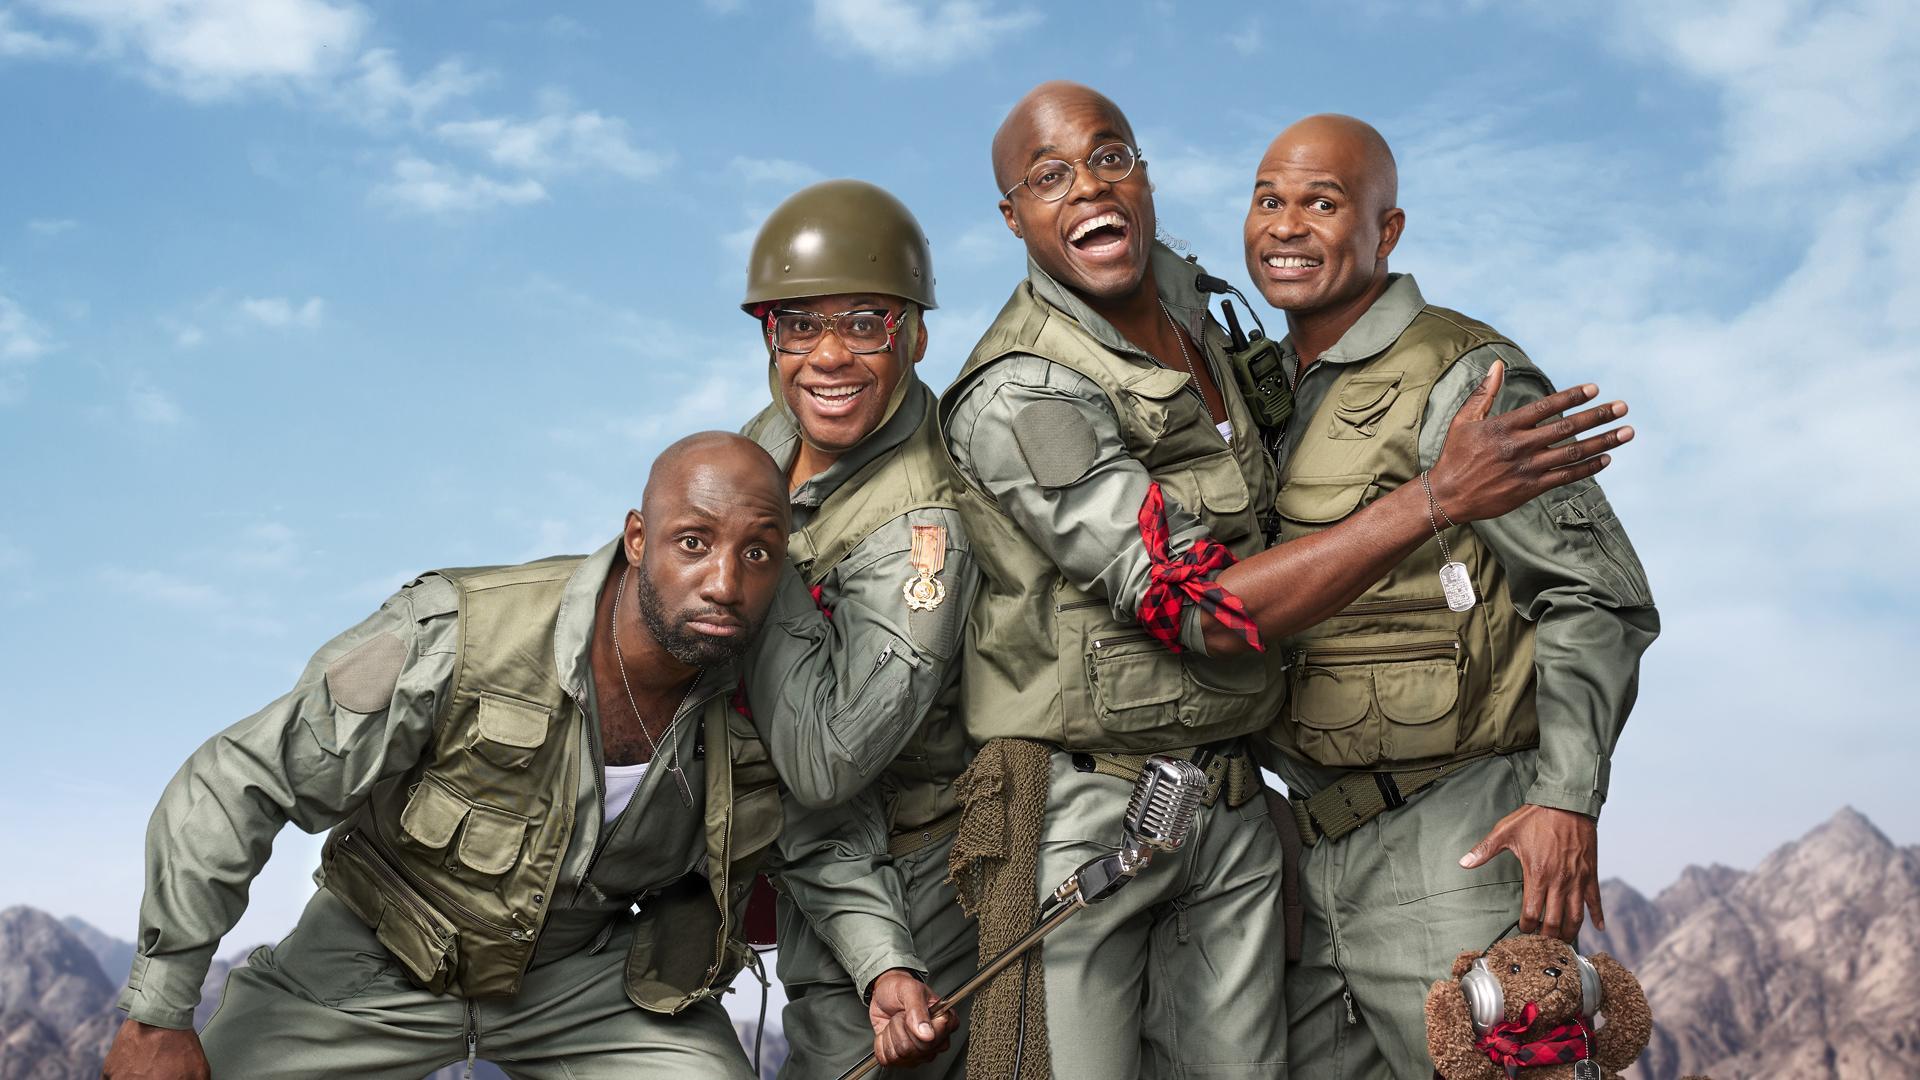 Caribbean Combo voegt na succes een extra show toe